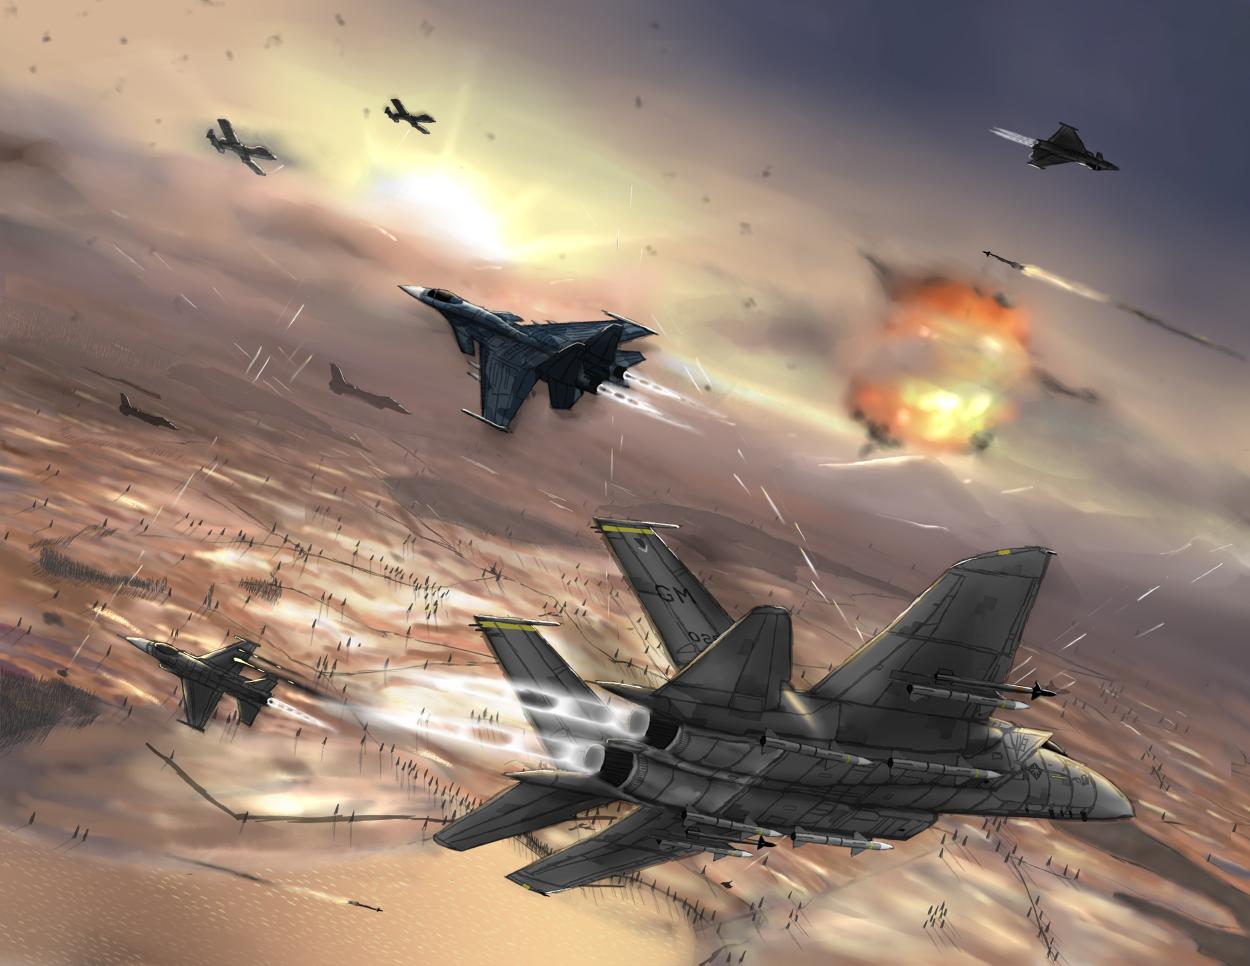 Ace Combat Wallpaper 1250x966 Ace Combat Eurofighter Typhoon F15 1250x966